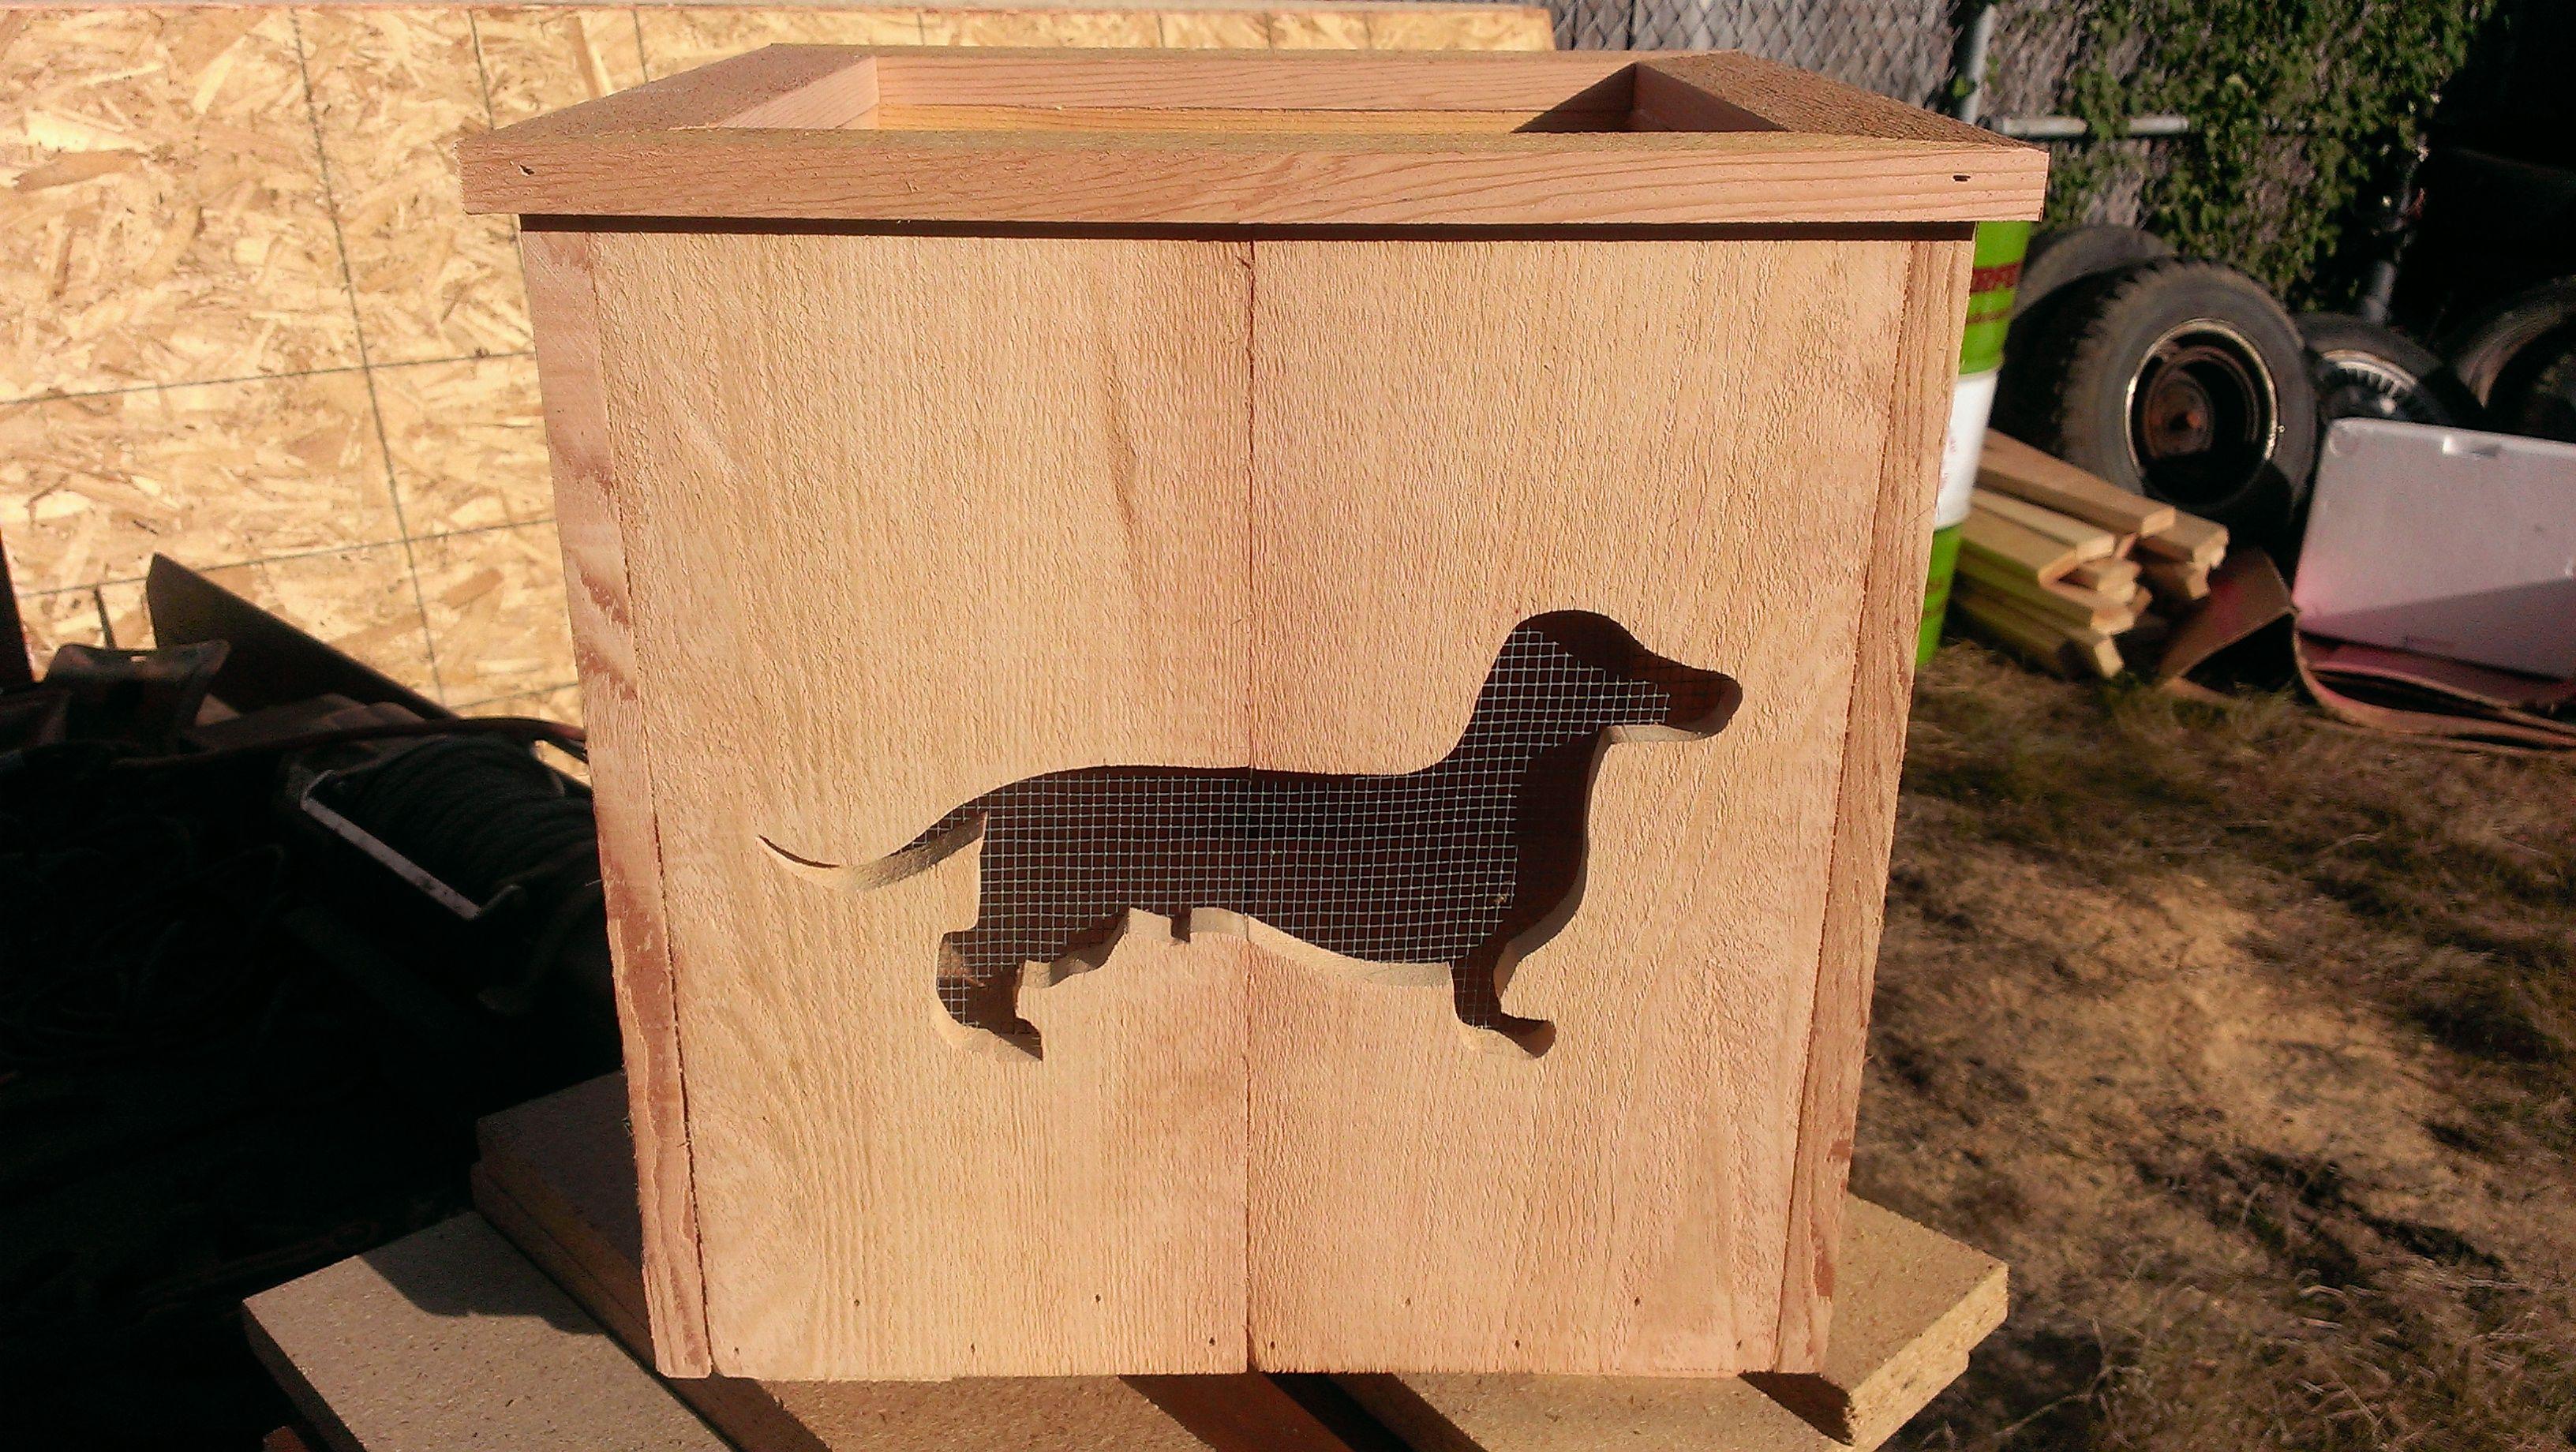 Stupell yorkie dog 3 panel decorative fireplace screen - Dog